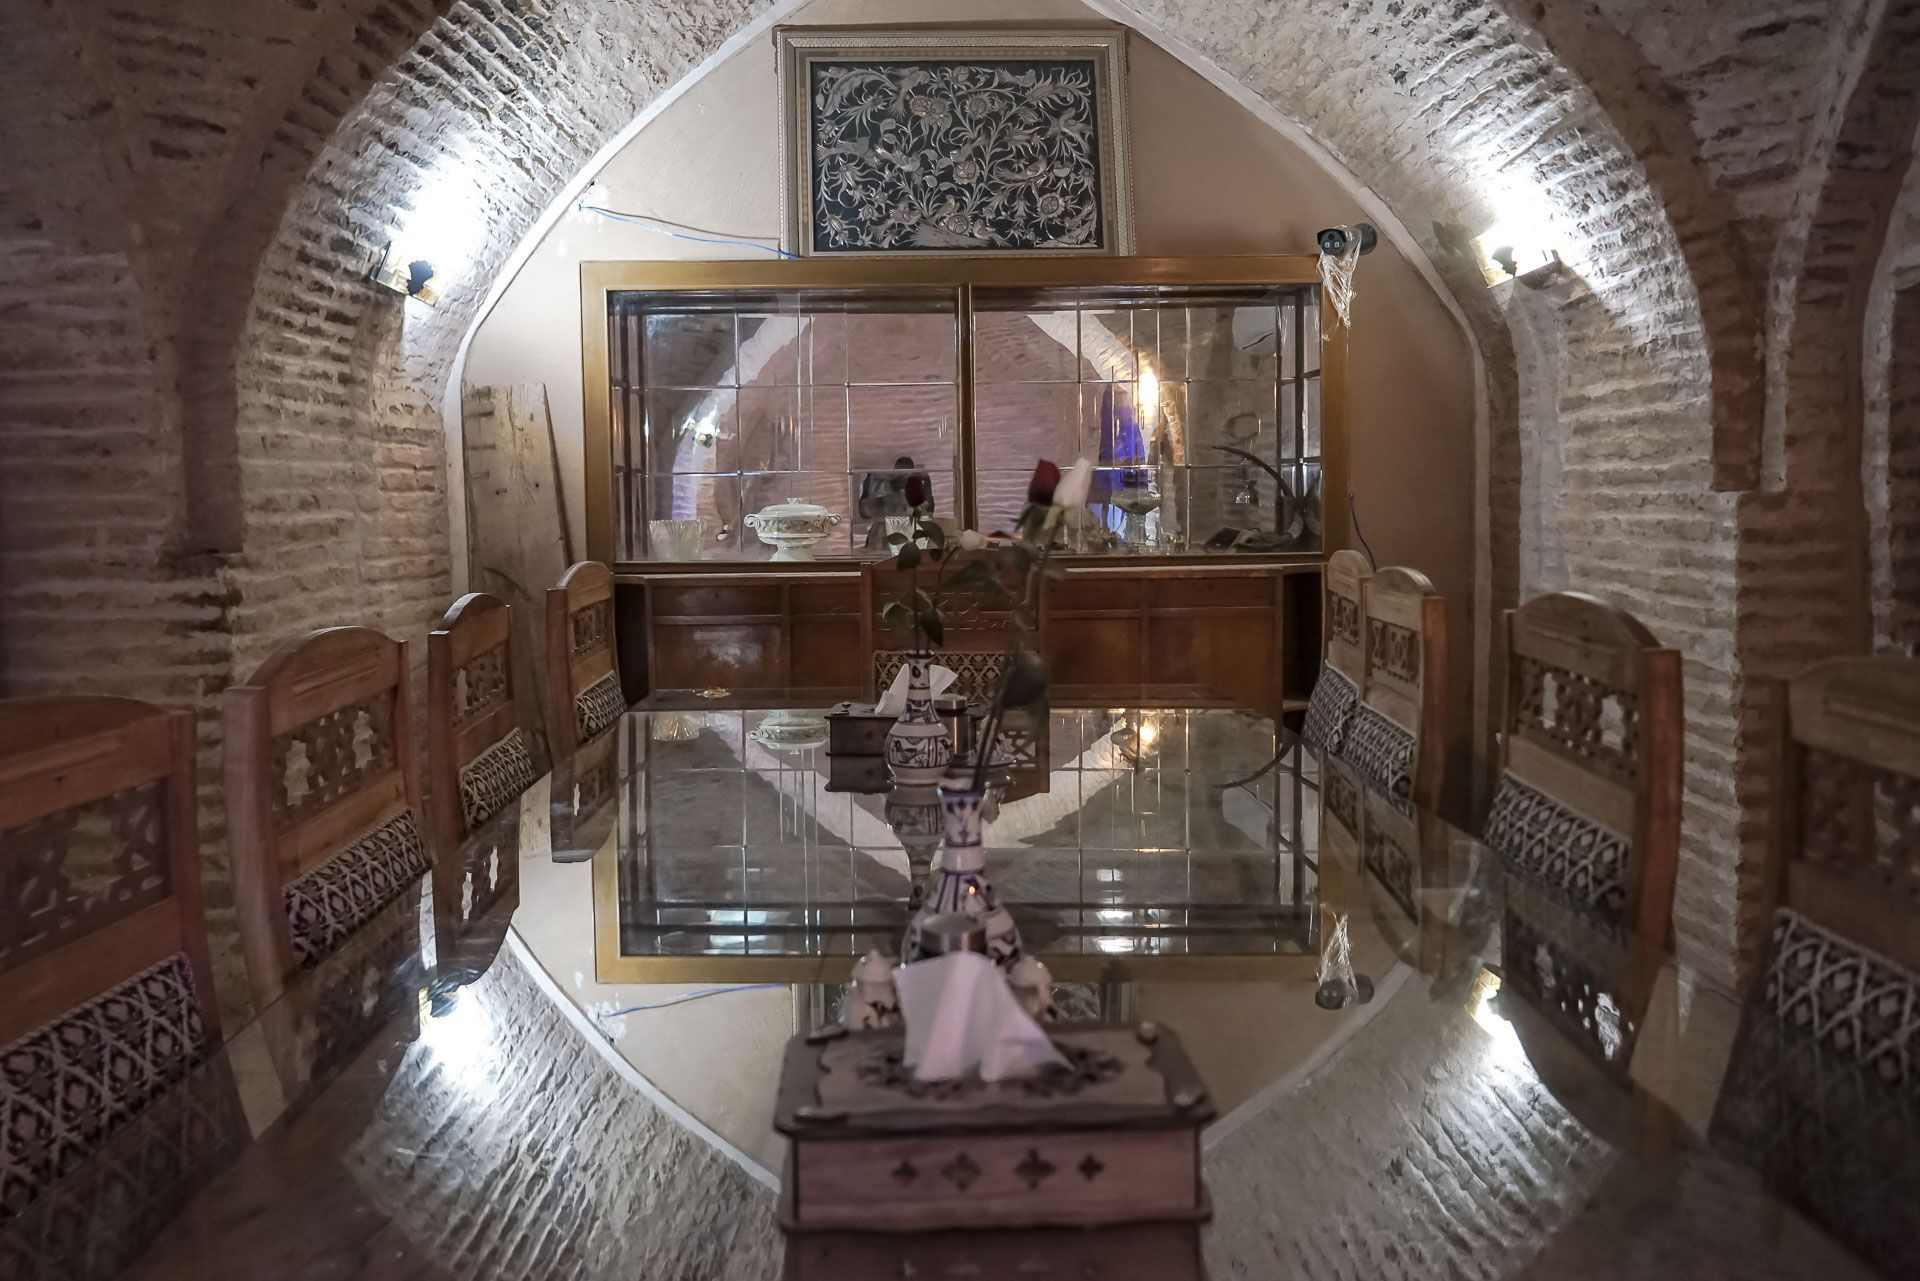 Lesvoyageuses-Iran-Desert-Central-Caravanserail-Kuhpa-13